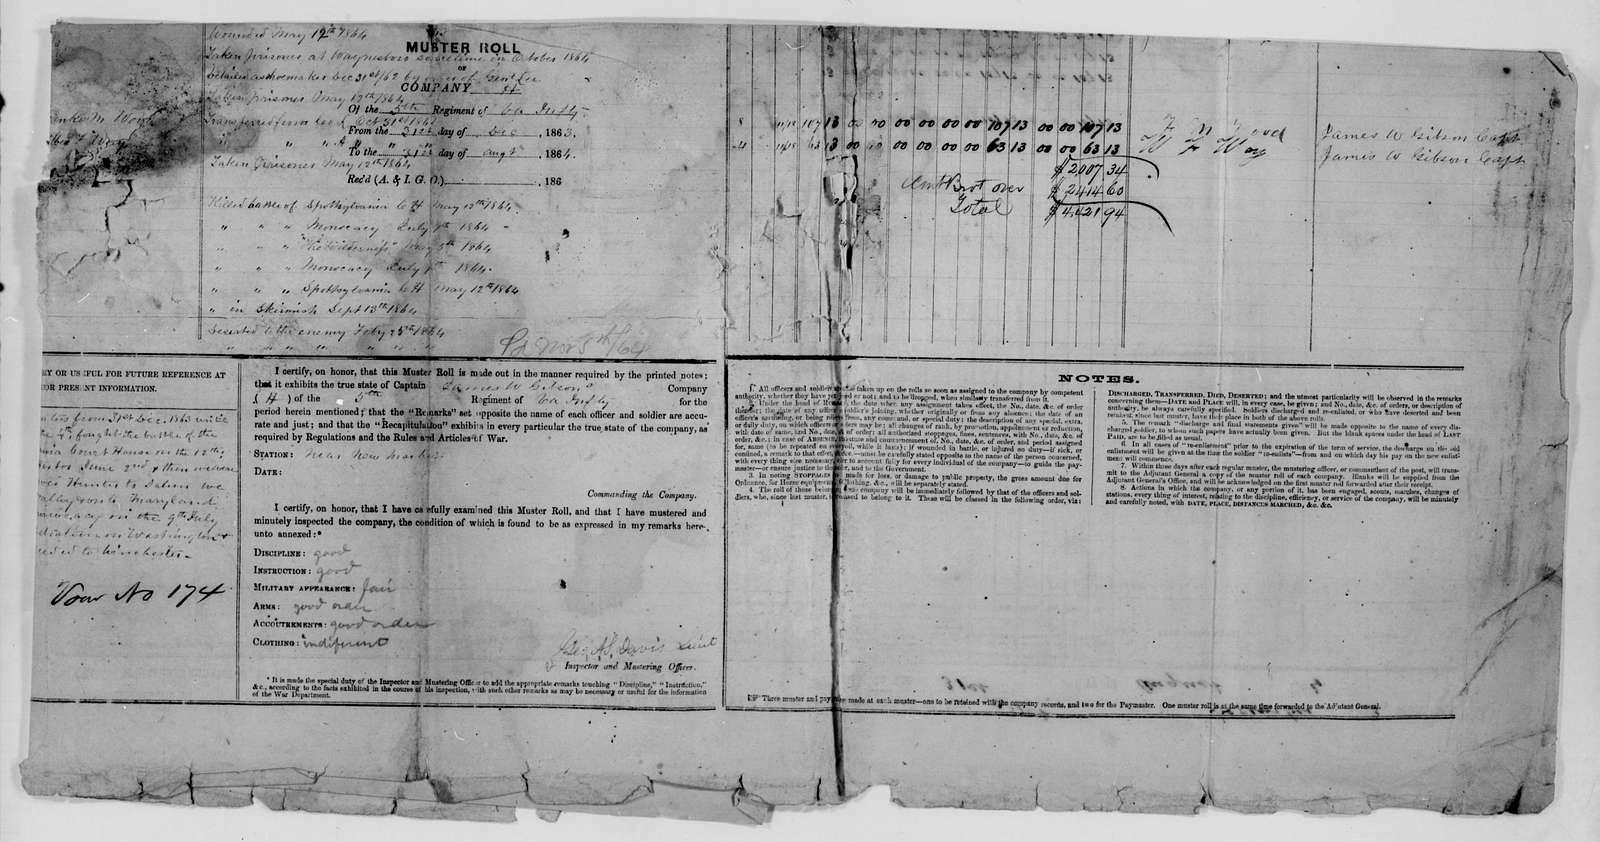 Confederate States of America records: Microfilm Reel 65